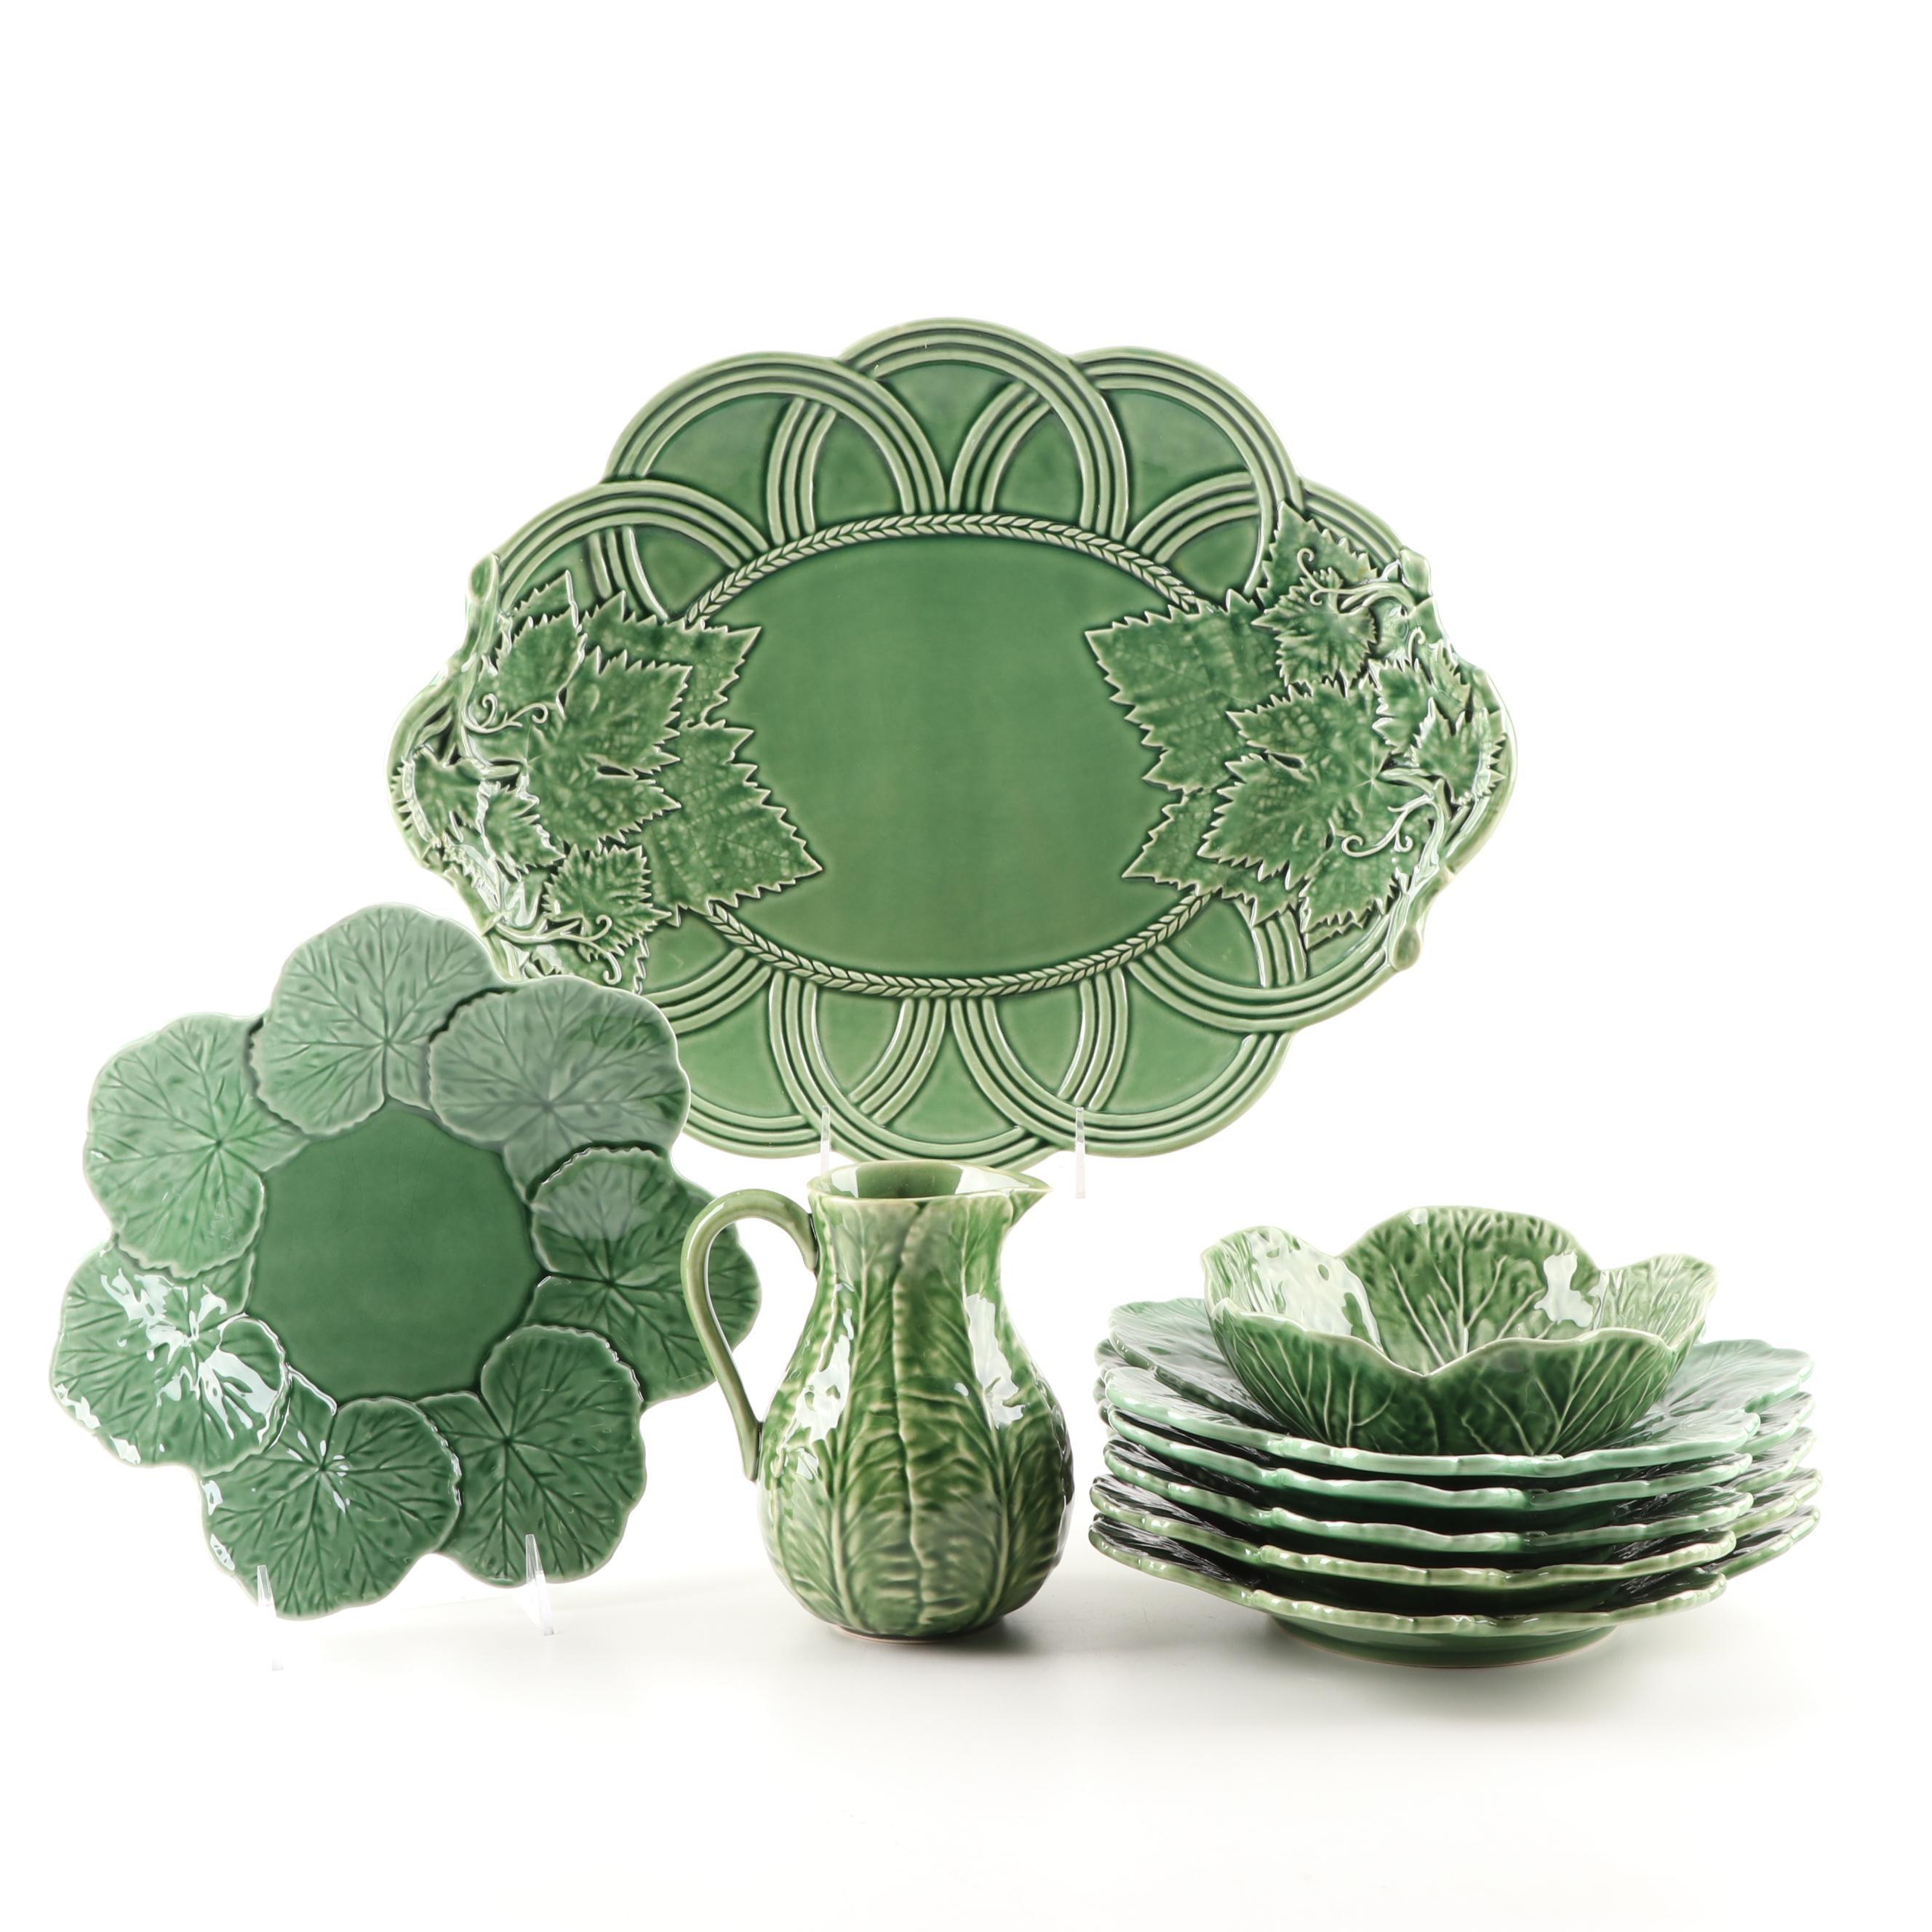 Bordallo Pinheiro Ceramic Leaf Platter, Plates, Bowl and Pitcher